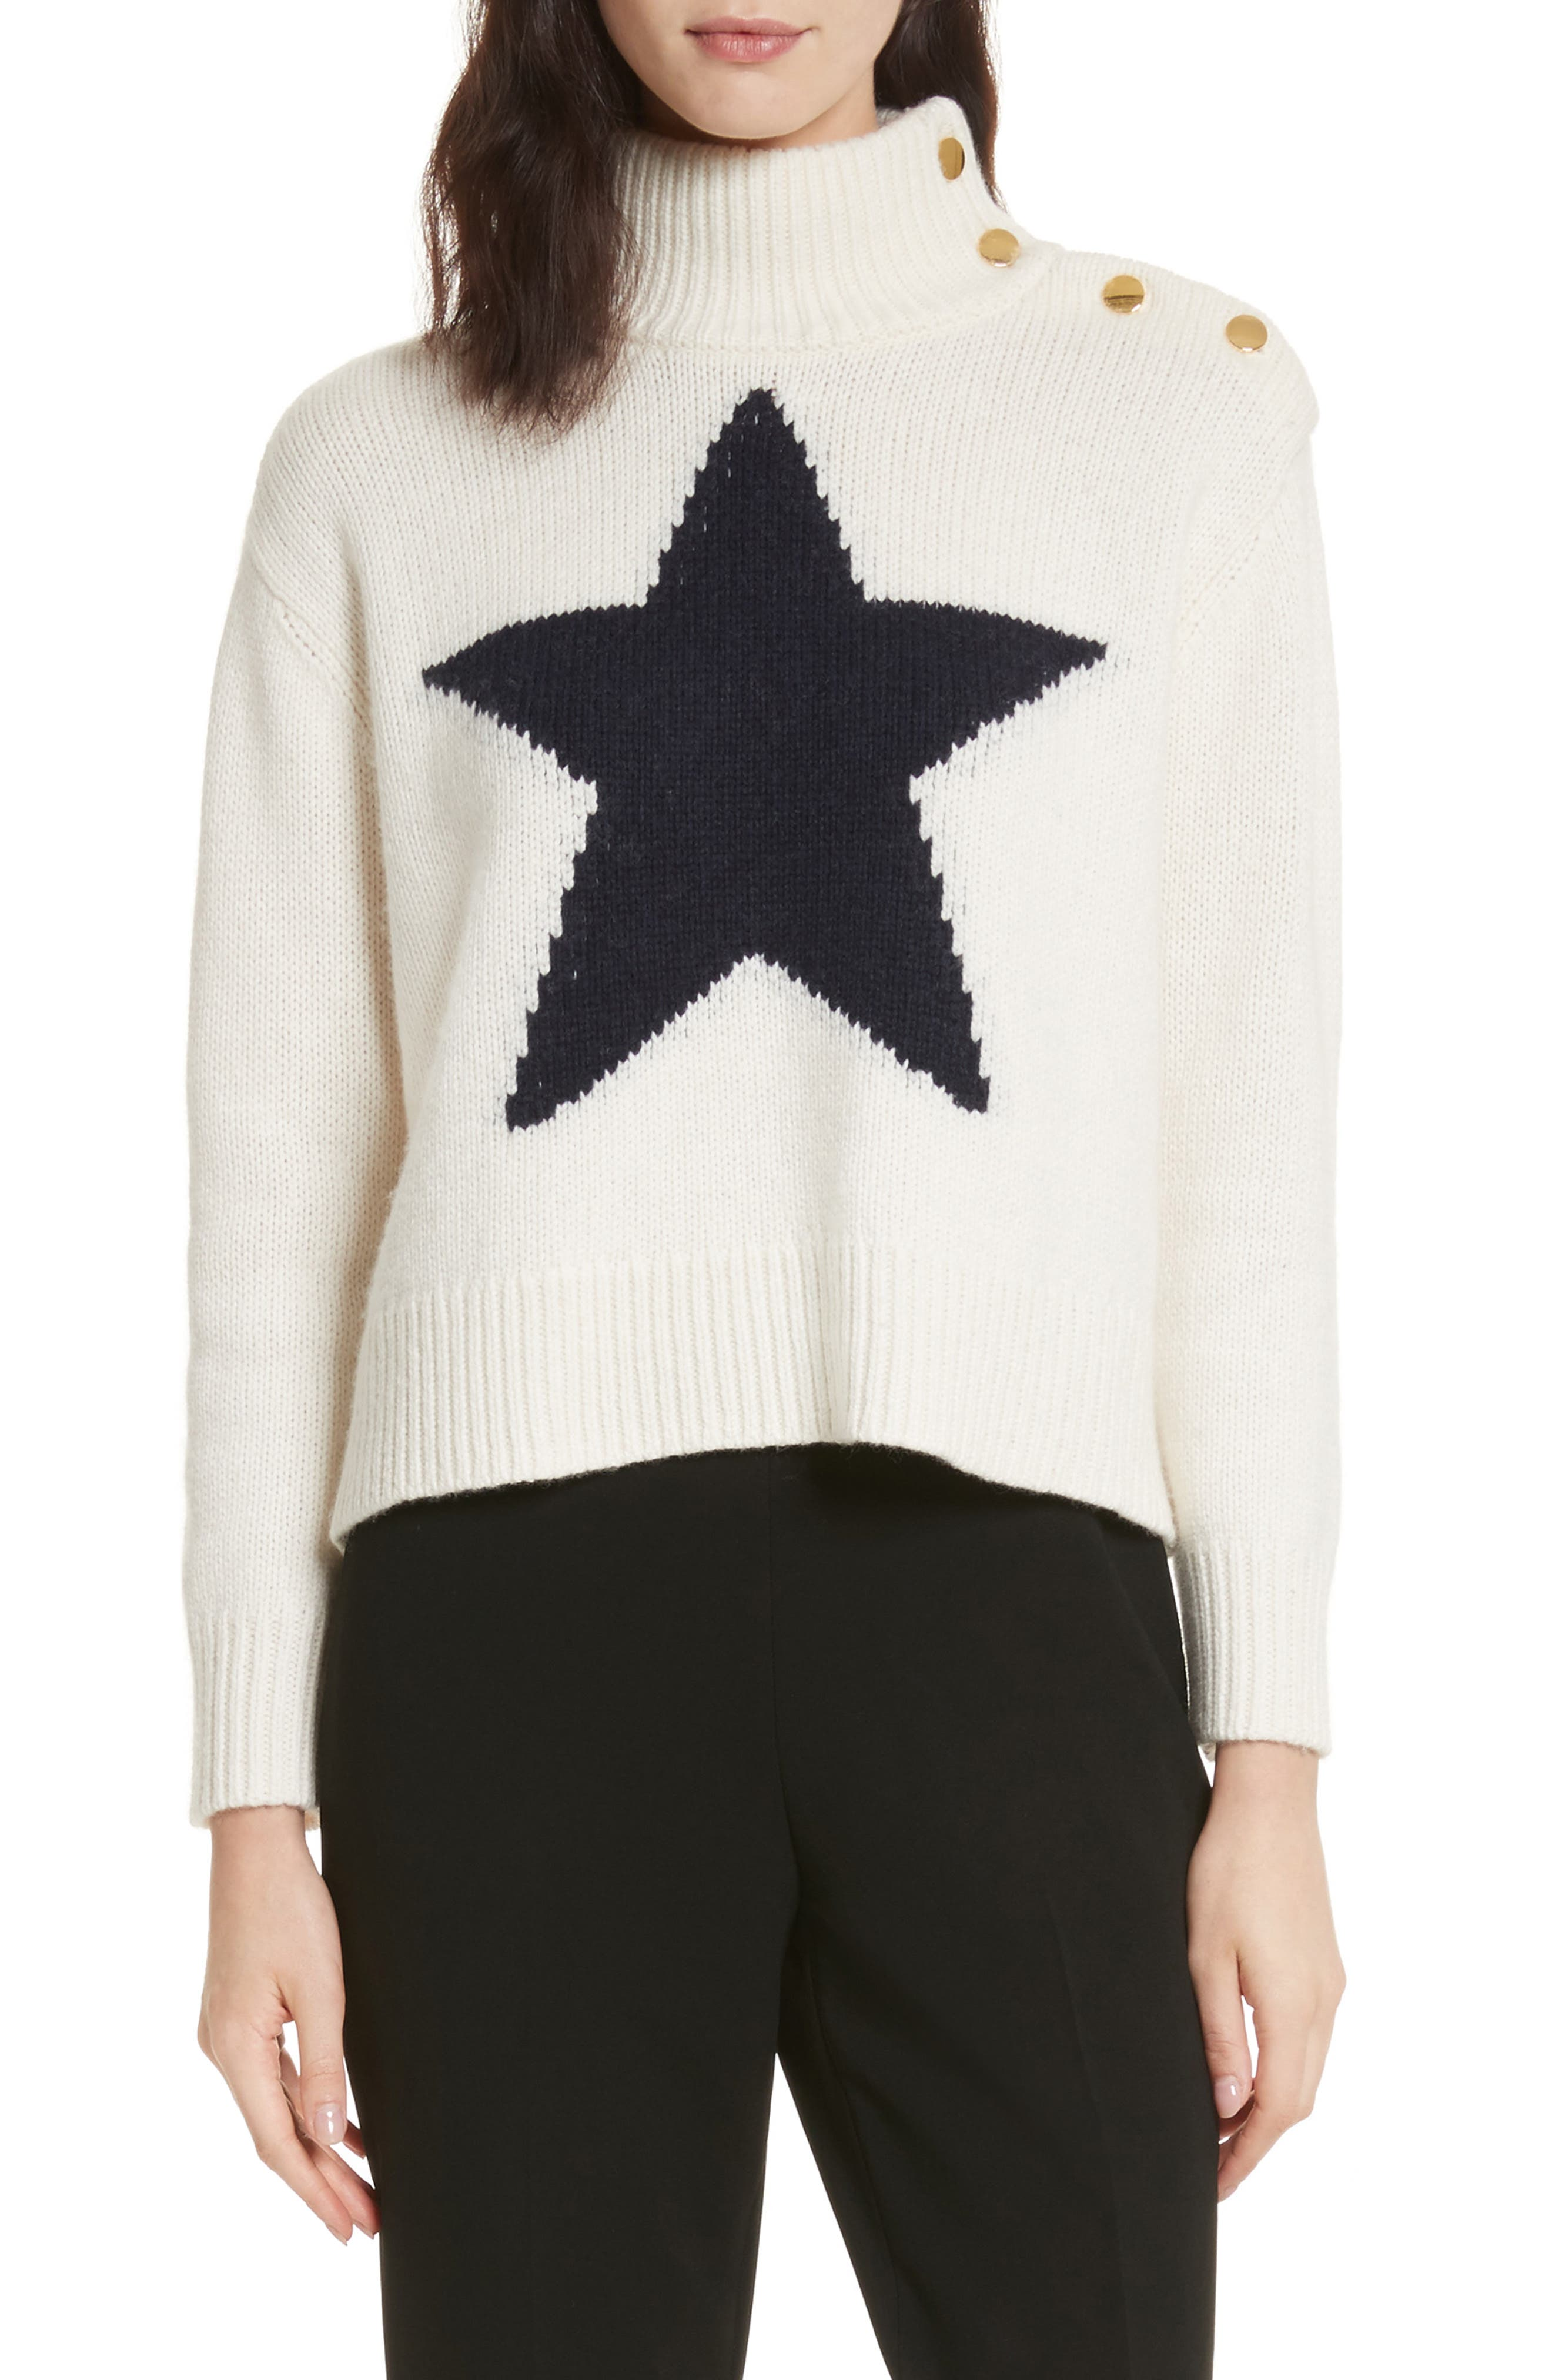 star turtleneck sweater,                             Main thumbnail 1, color,                             Cream/ Navy